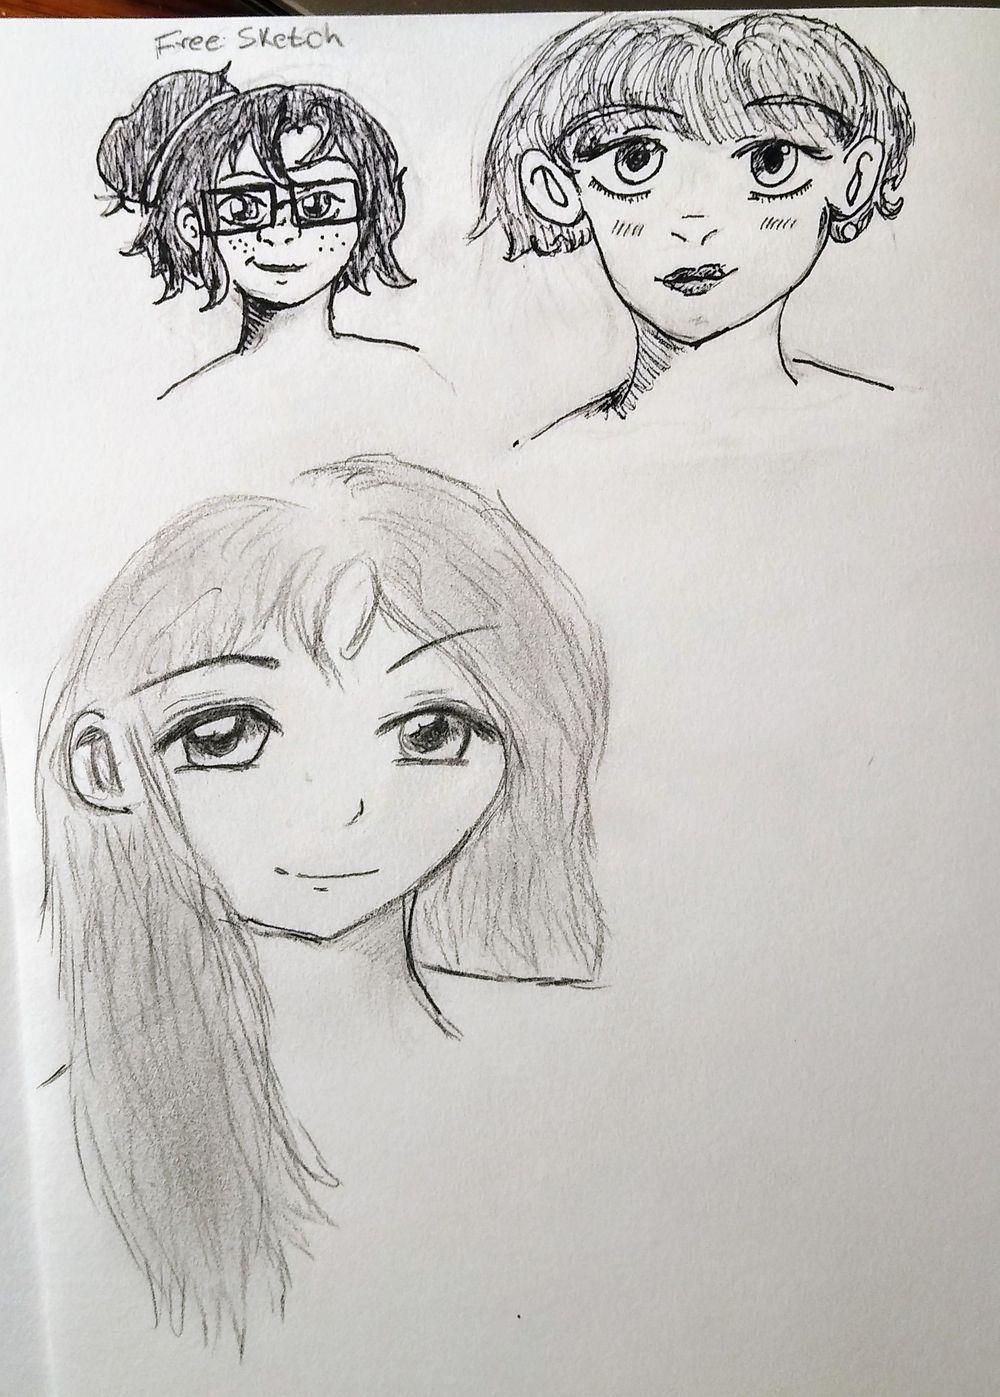 Manga-Styled Portrait - image 1 - student project